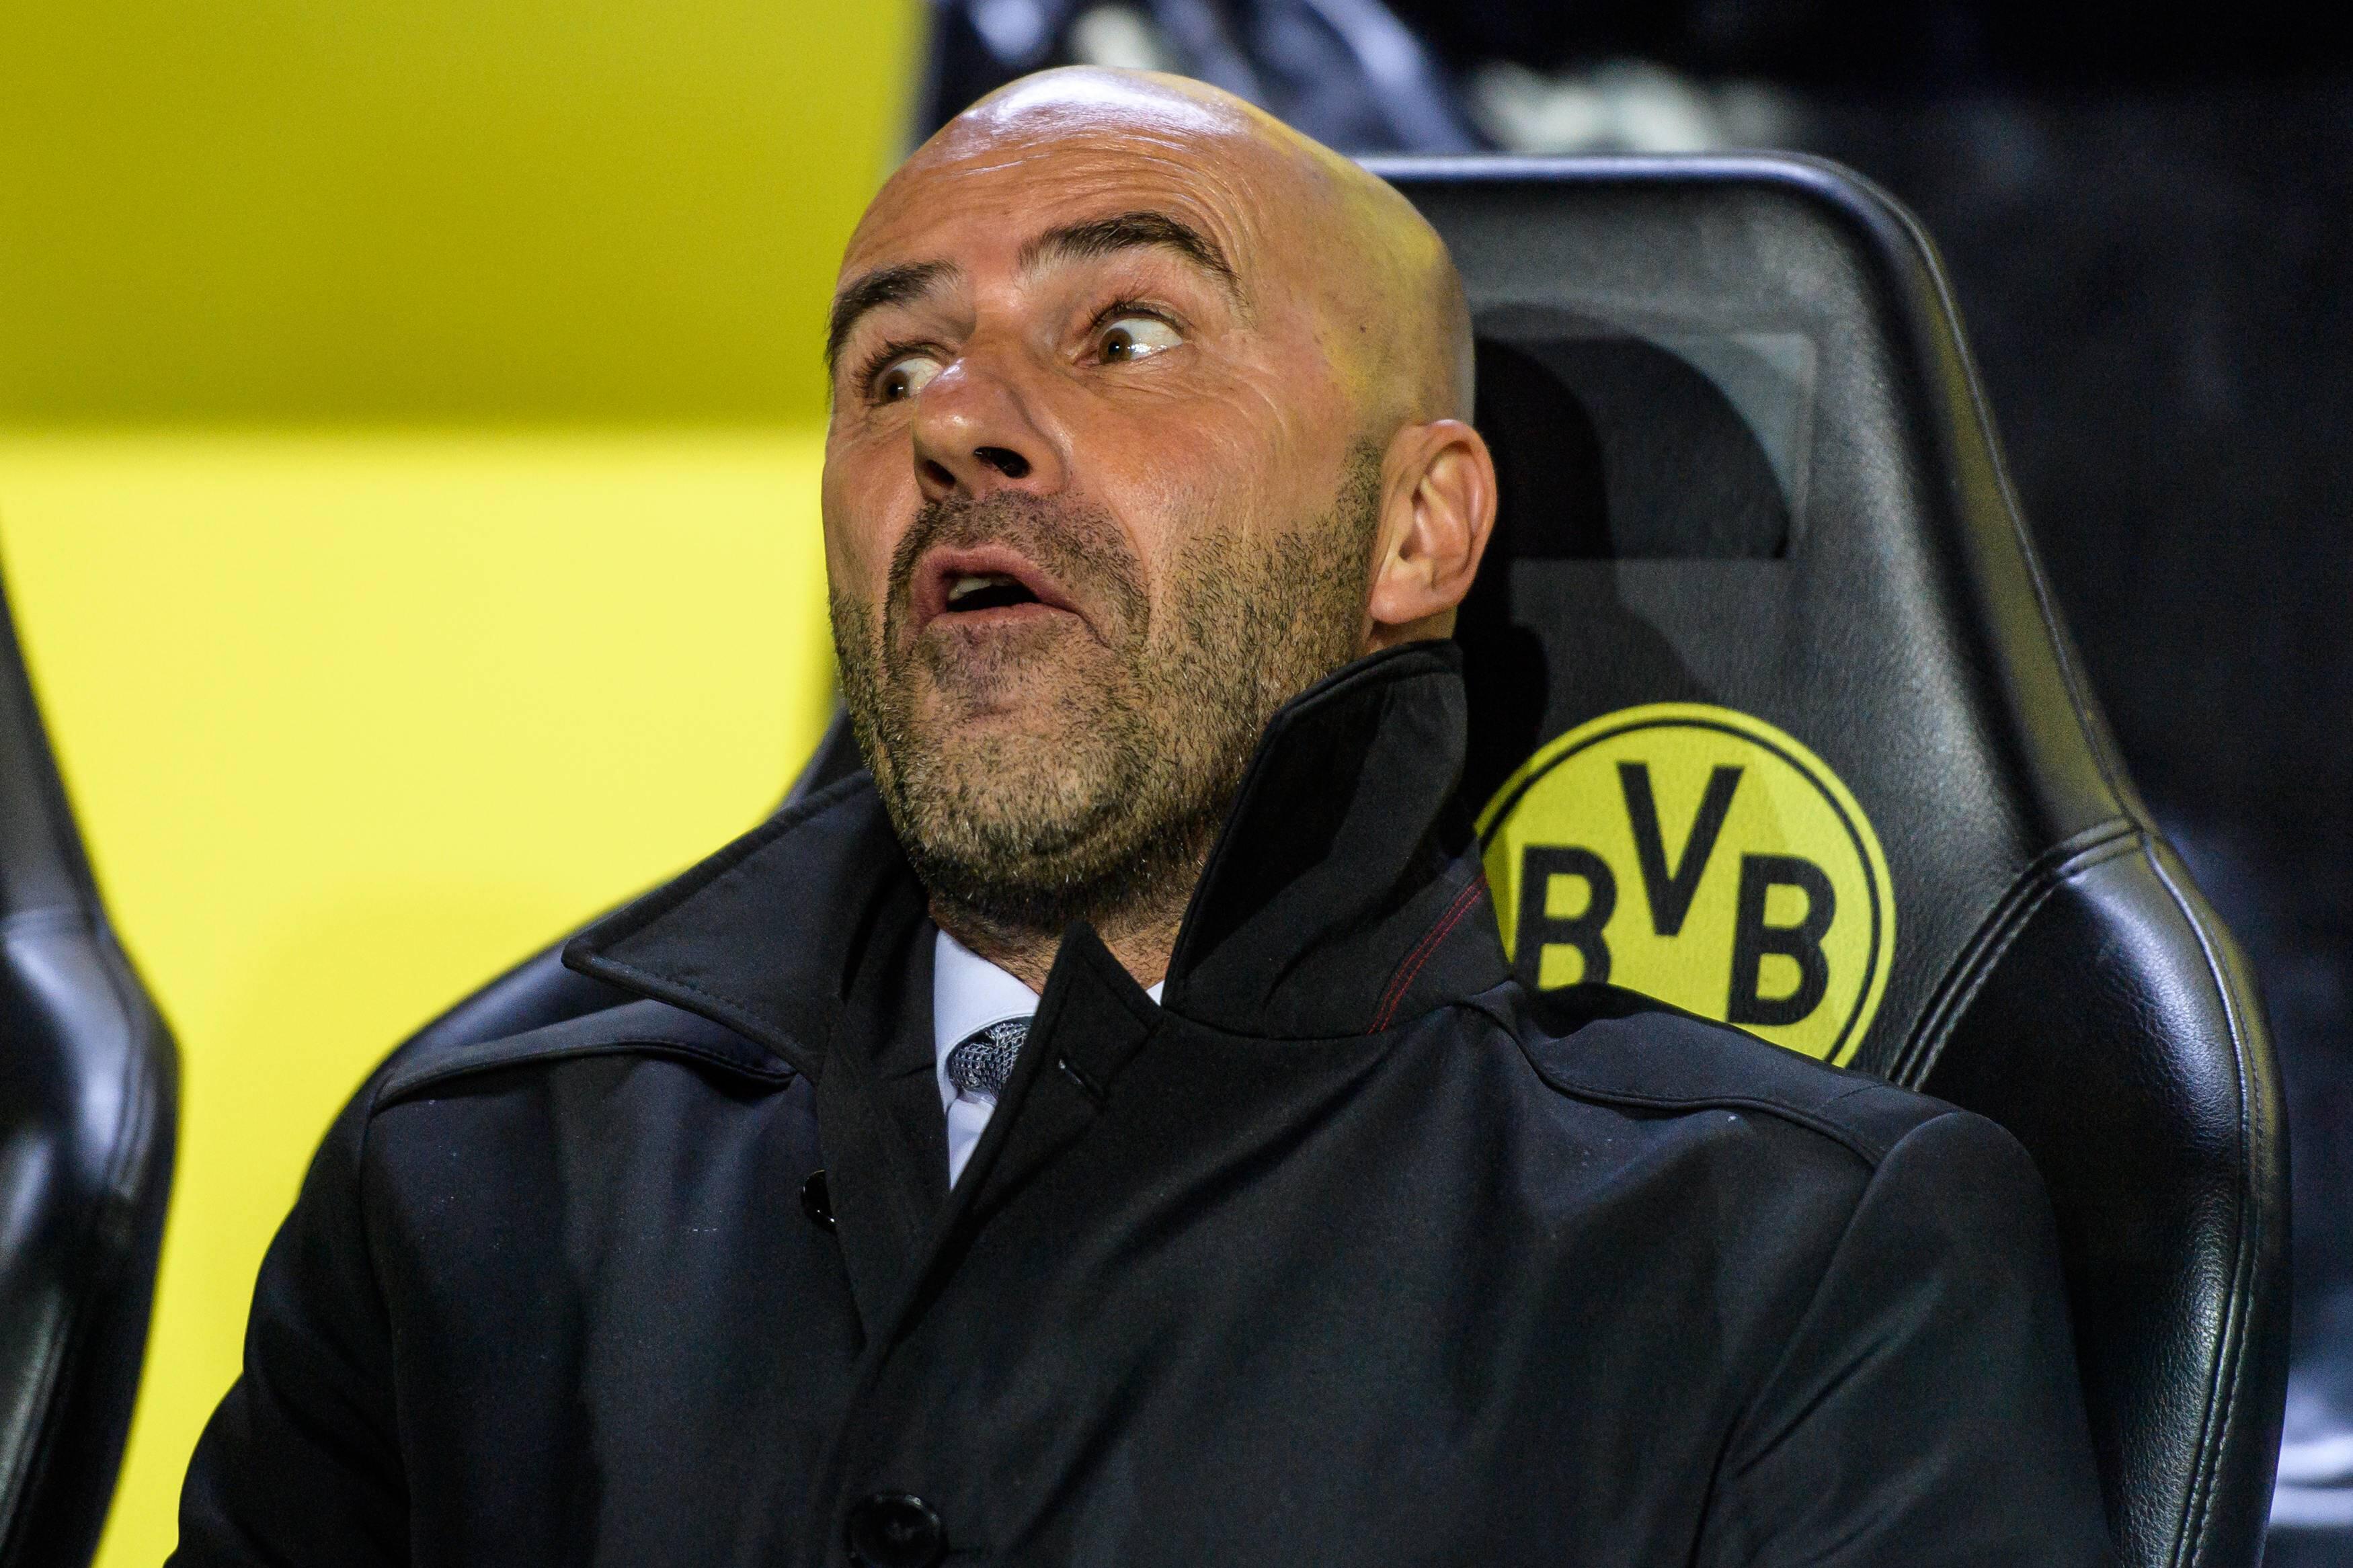 Bild zu Jupp Heynckes, Peter Bosz, Bundesliga, Trainer, Fazit